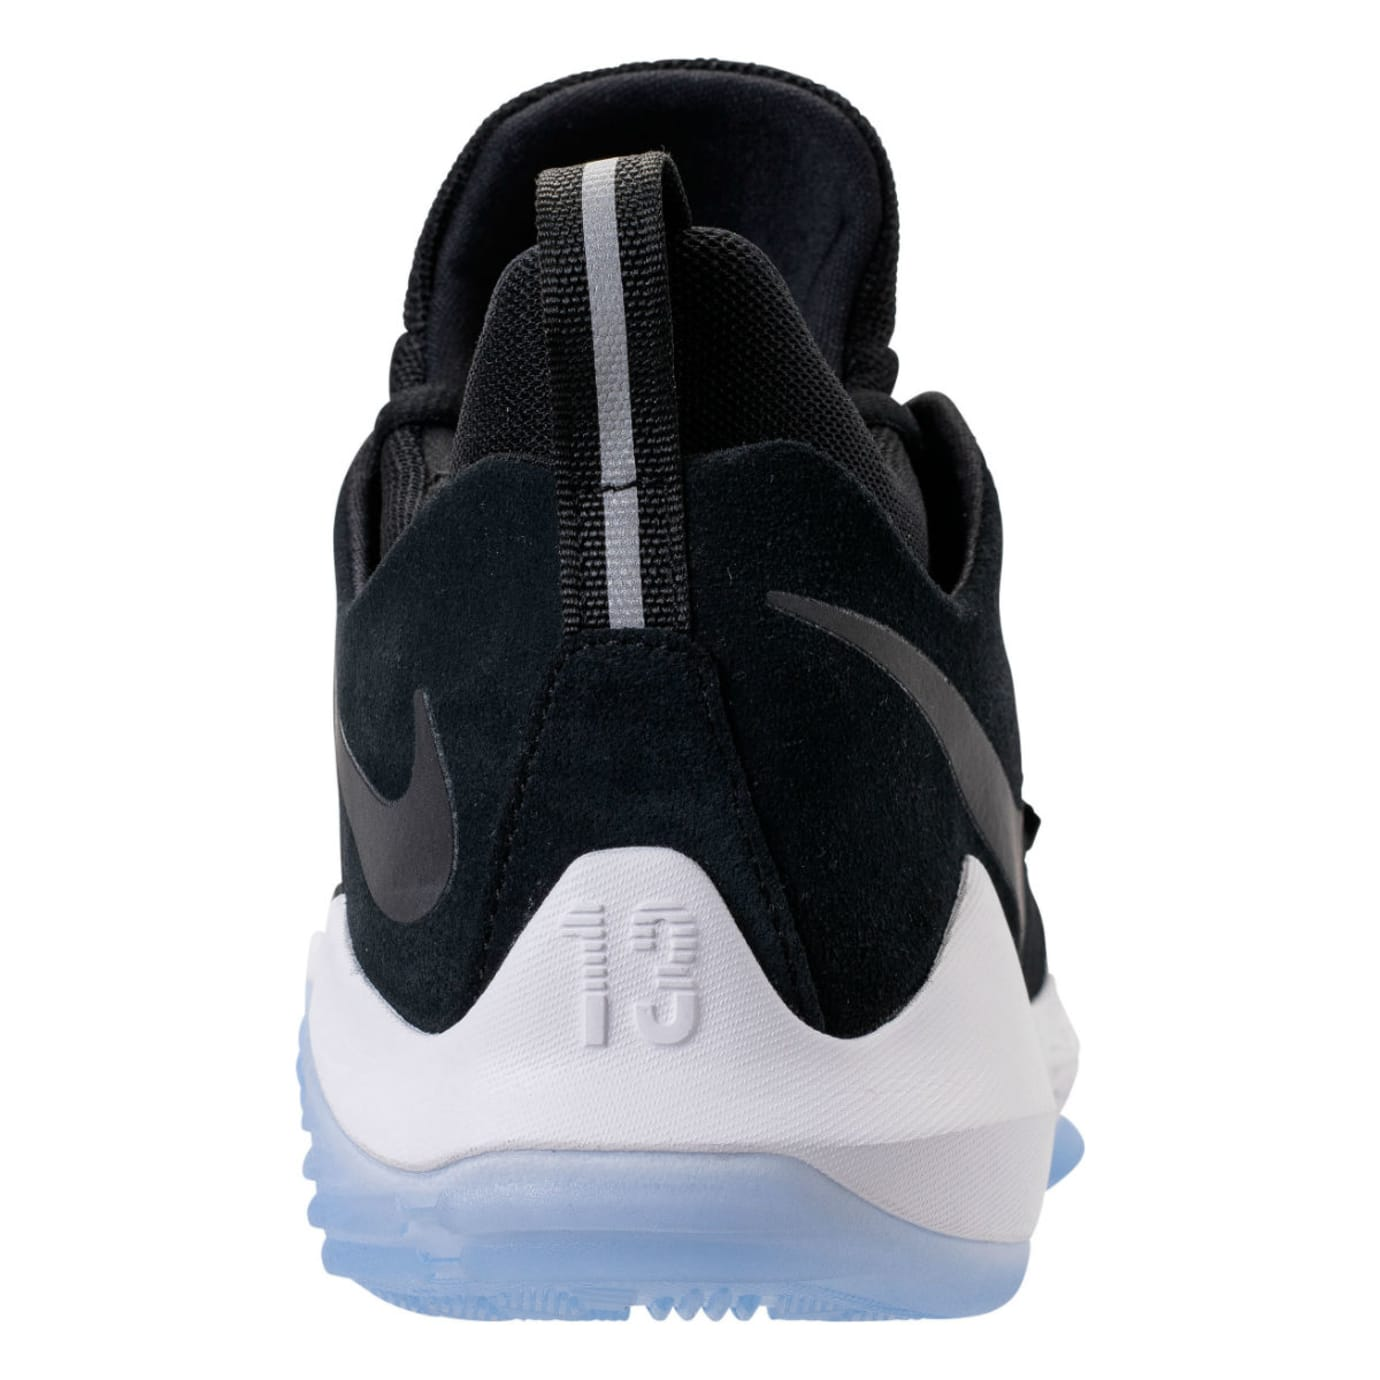 hot sales 4fb38 3be39 Nike PG1 Black White Hyper Turquoise Release Date Heel 878627-001